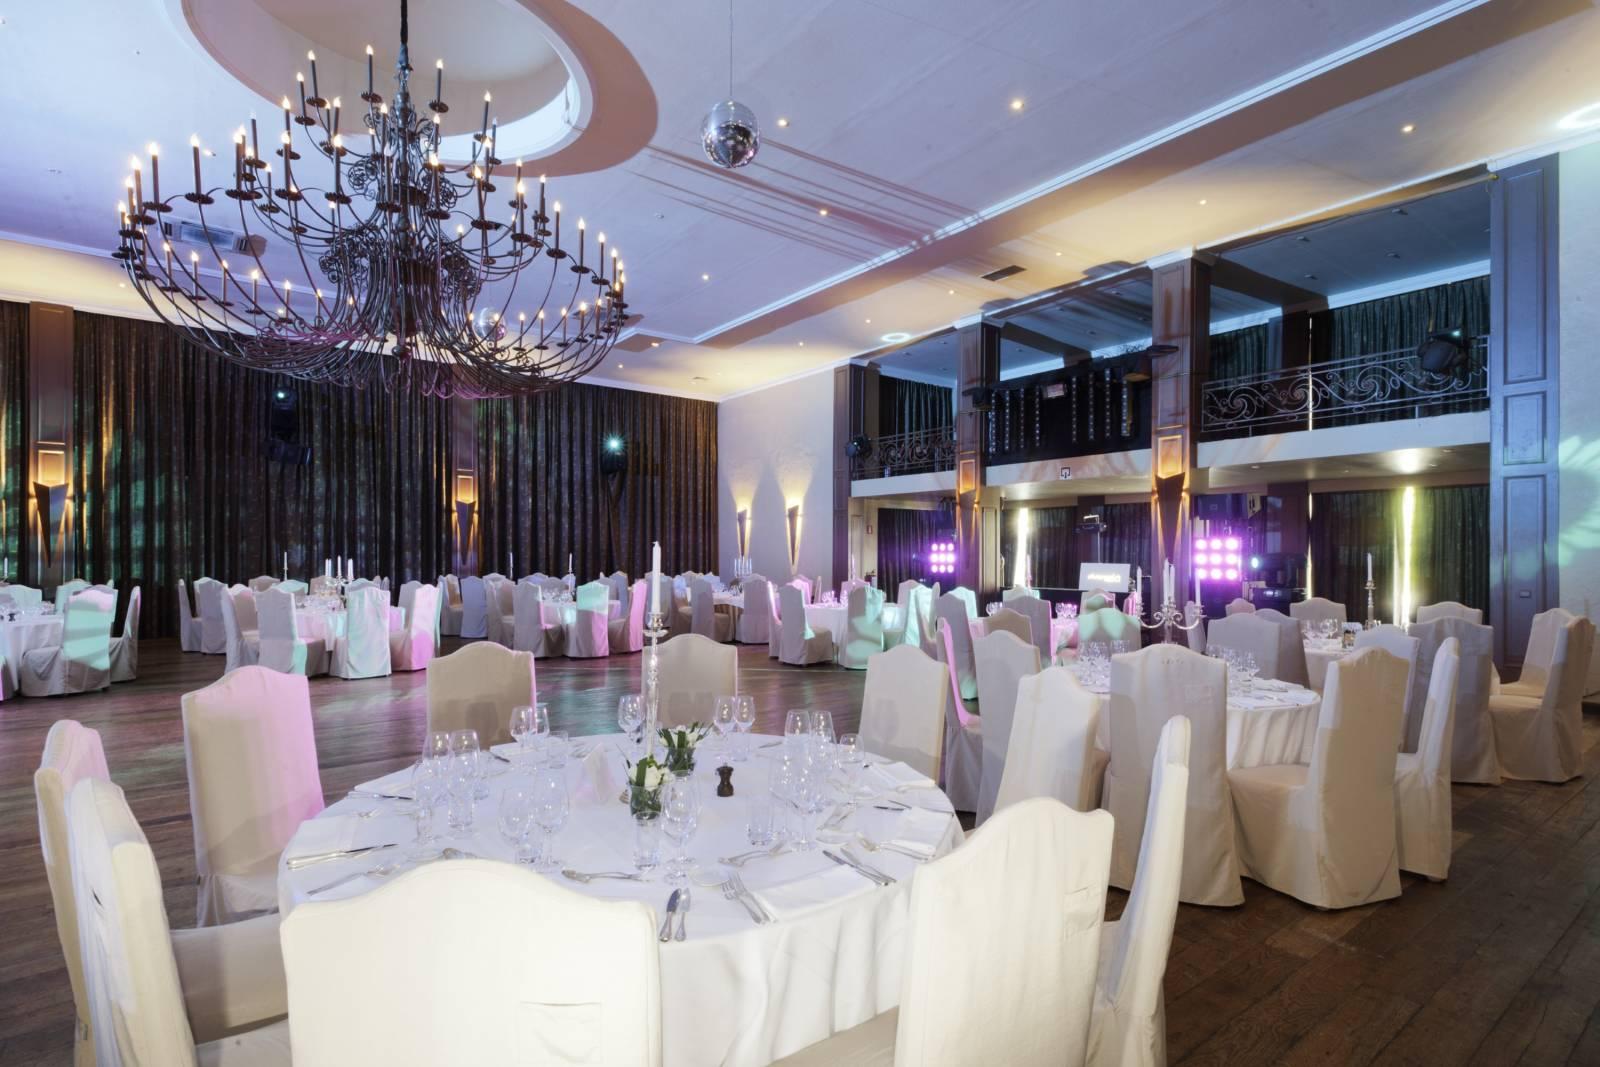 Cortina Wevelgem - Feestzaal - House of Weddings (4)